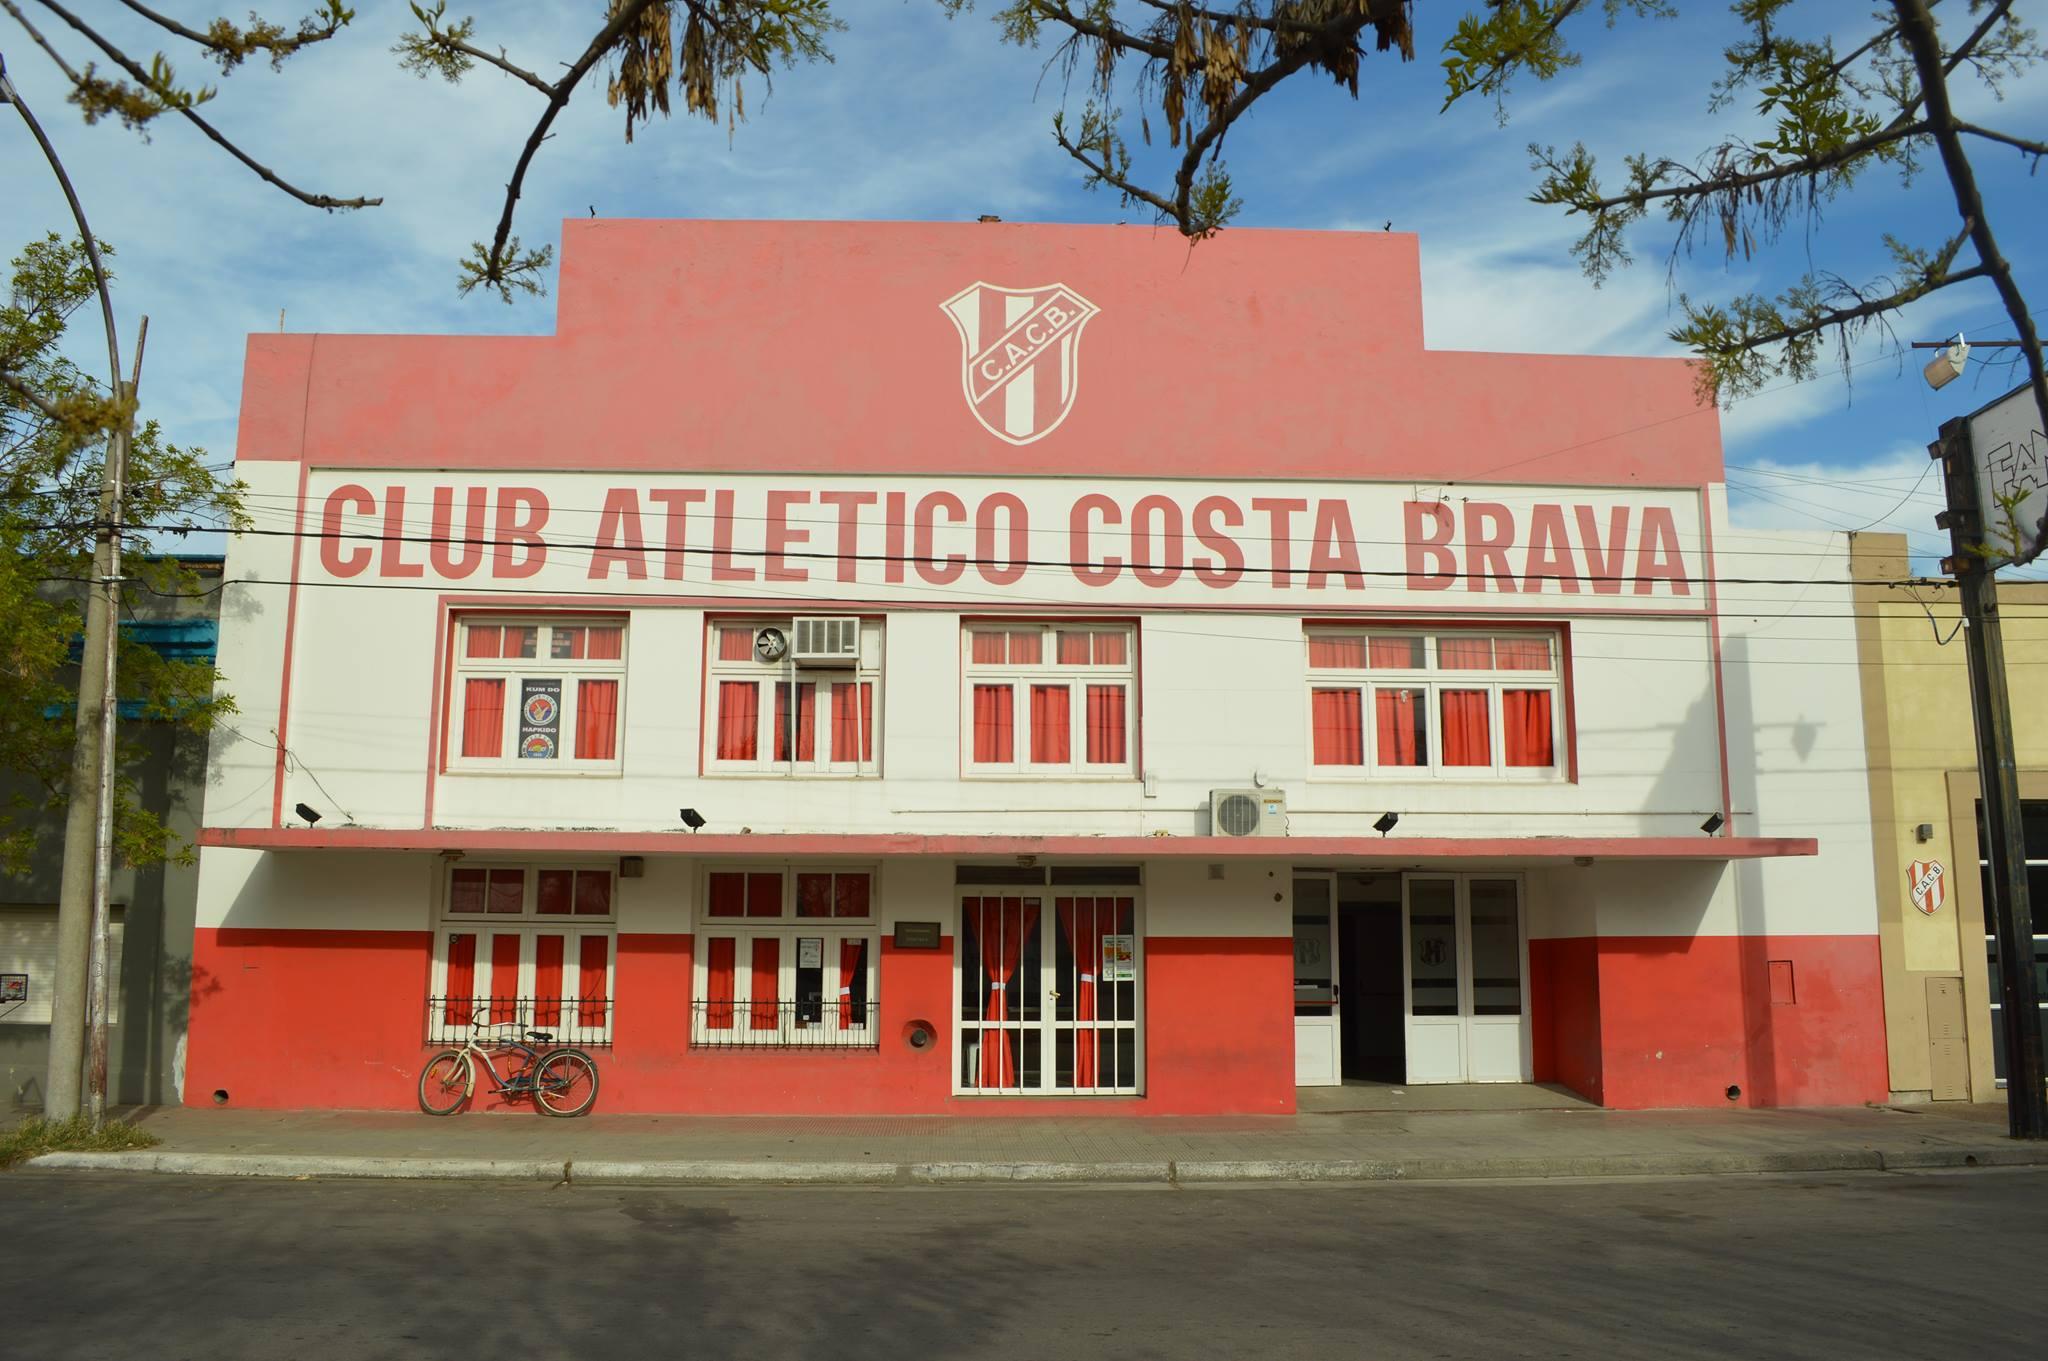 COVID-19: Clubes piquenses volverán a abrir sus puertas el próximo lunes